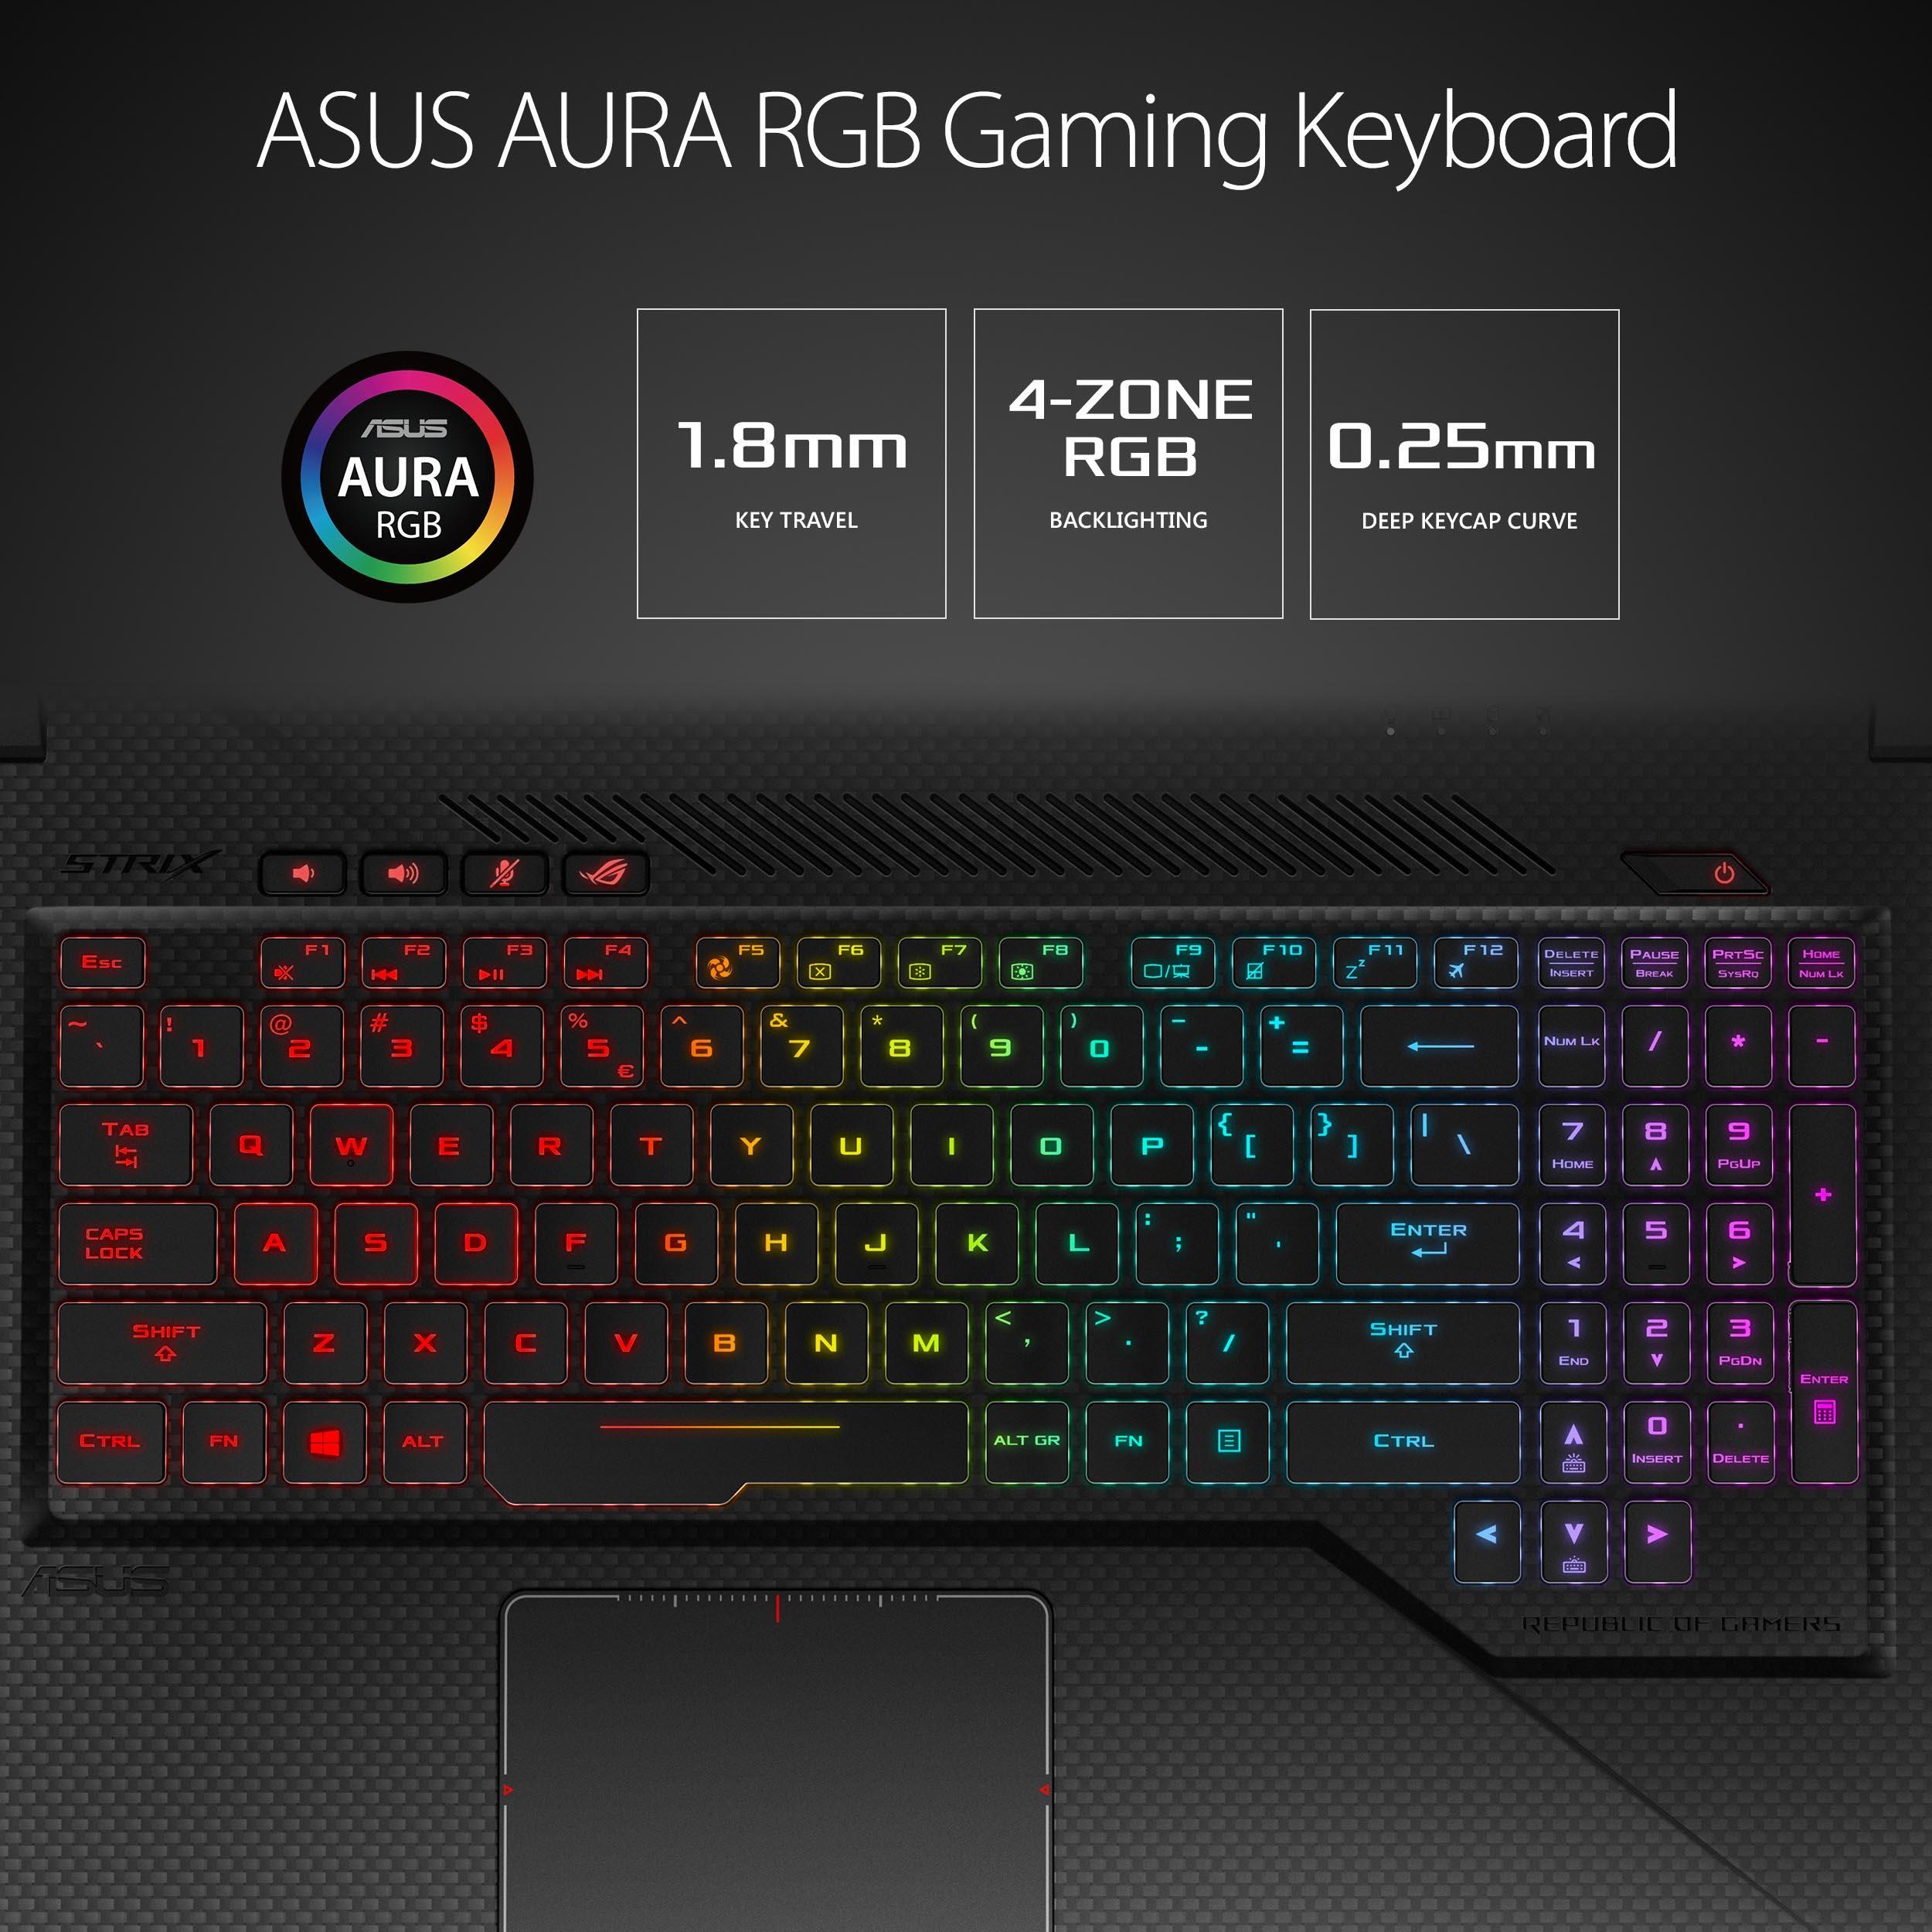 Asus Rog Strix Gl703vm Gaming Laptop Gadgitechstore Com